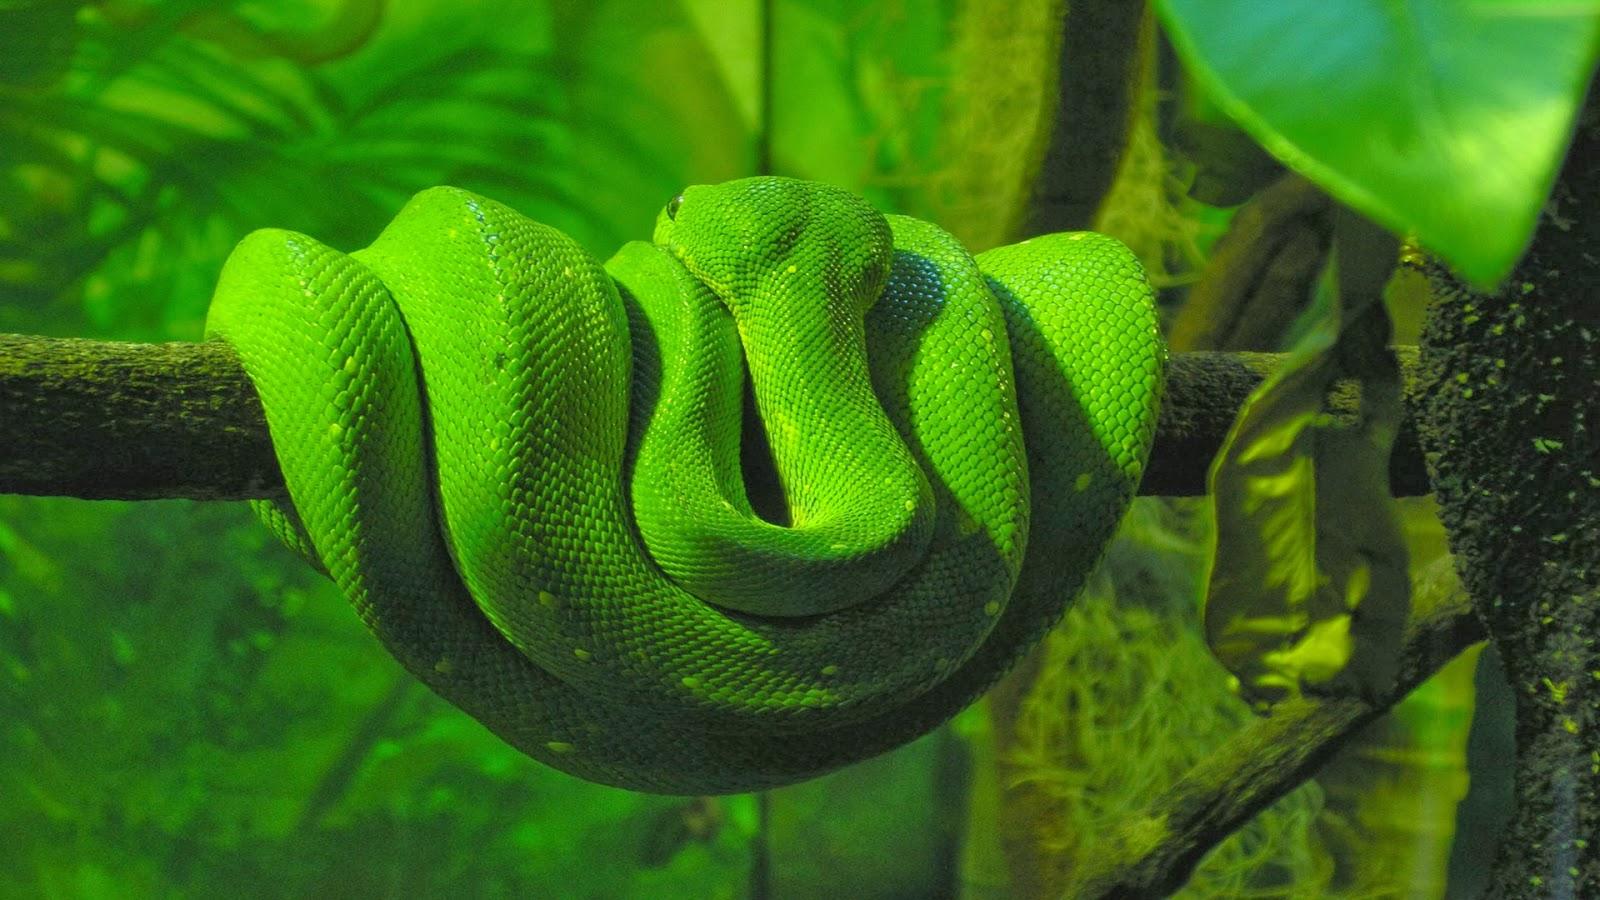 film ular putih dan ular hijau gambar abstrak hitam putih